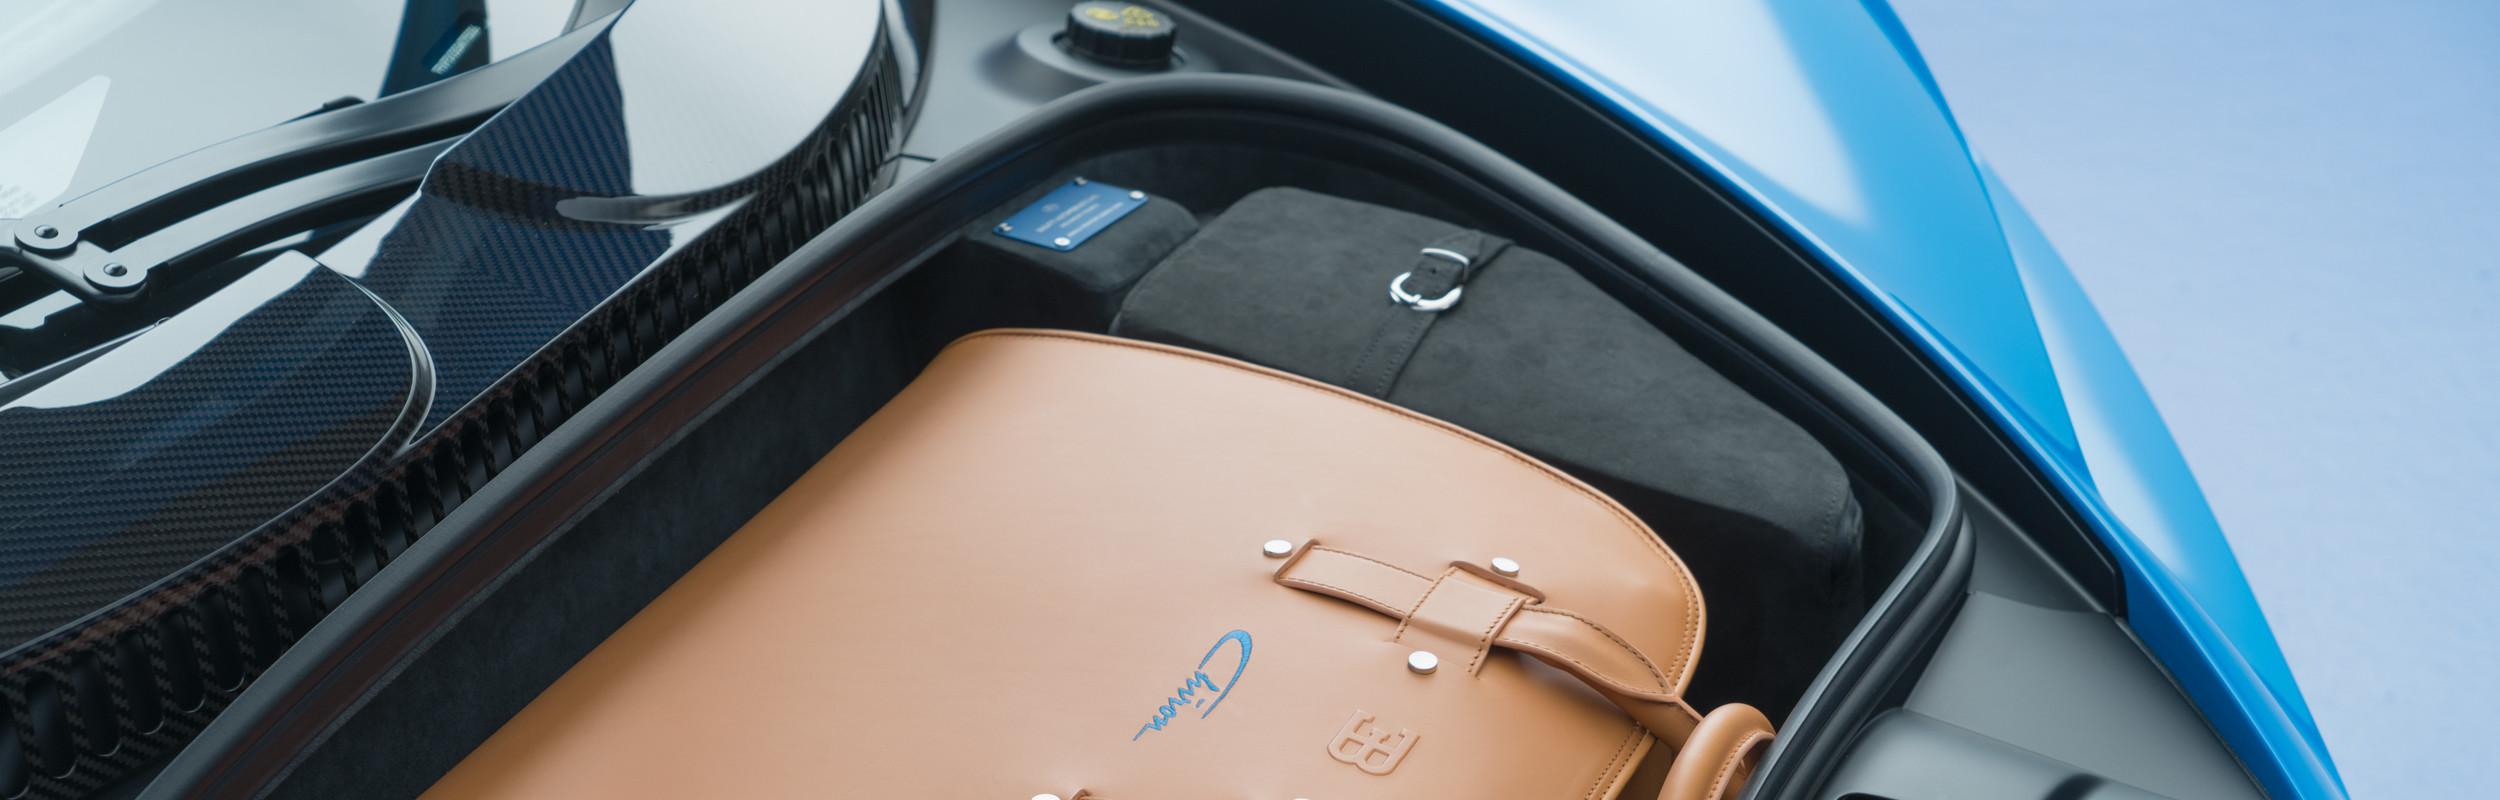 Bugatti Chiron Bagażnik